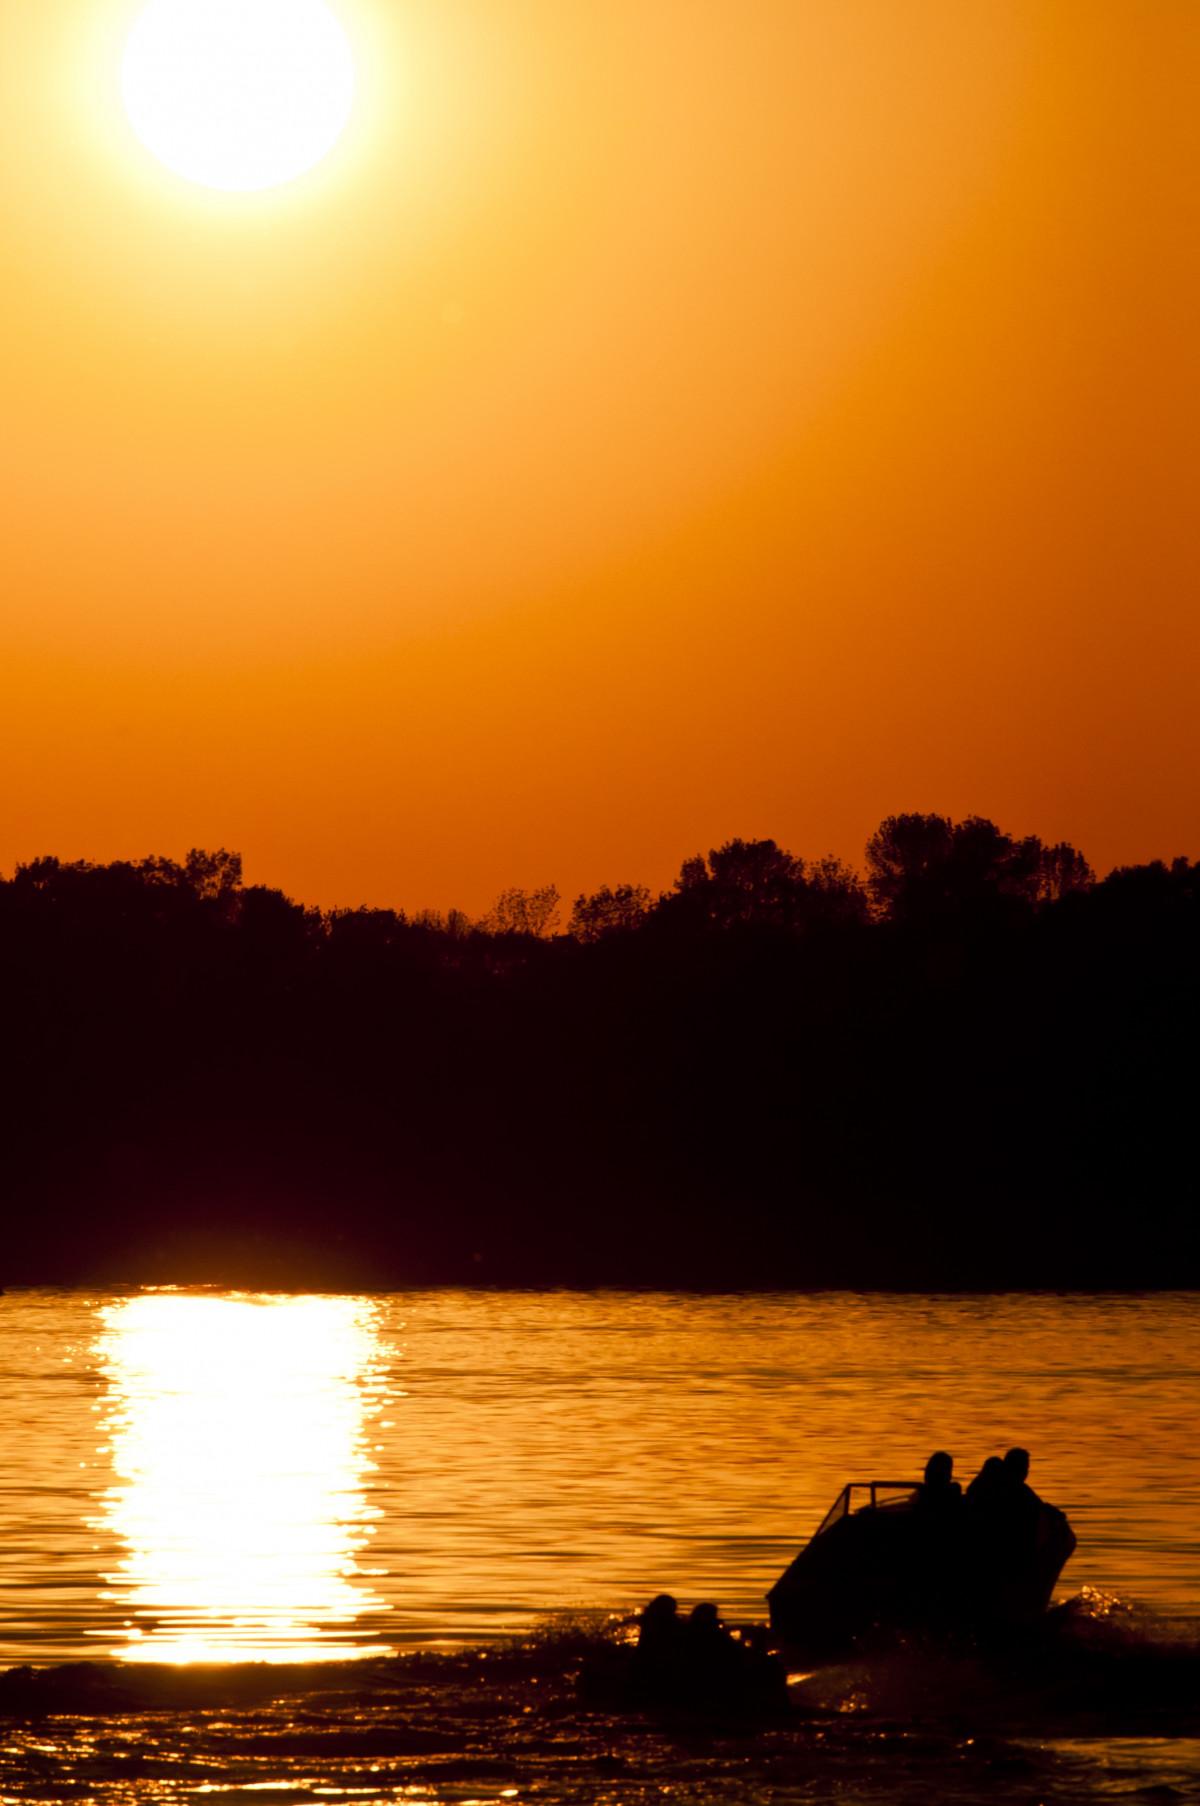 free images   landscape  sea  water  nature  ocean  horizon  dock  cloud  sunrise  sunset  shore